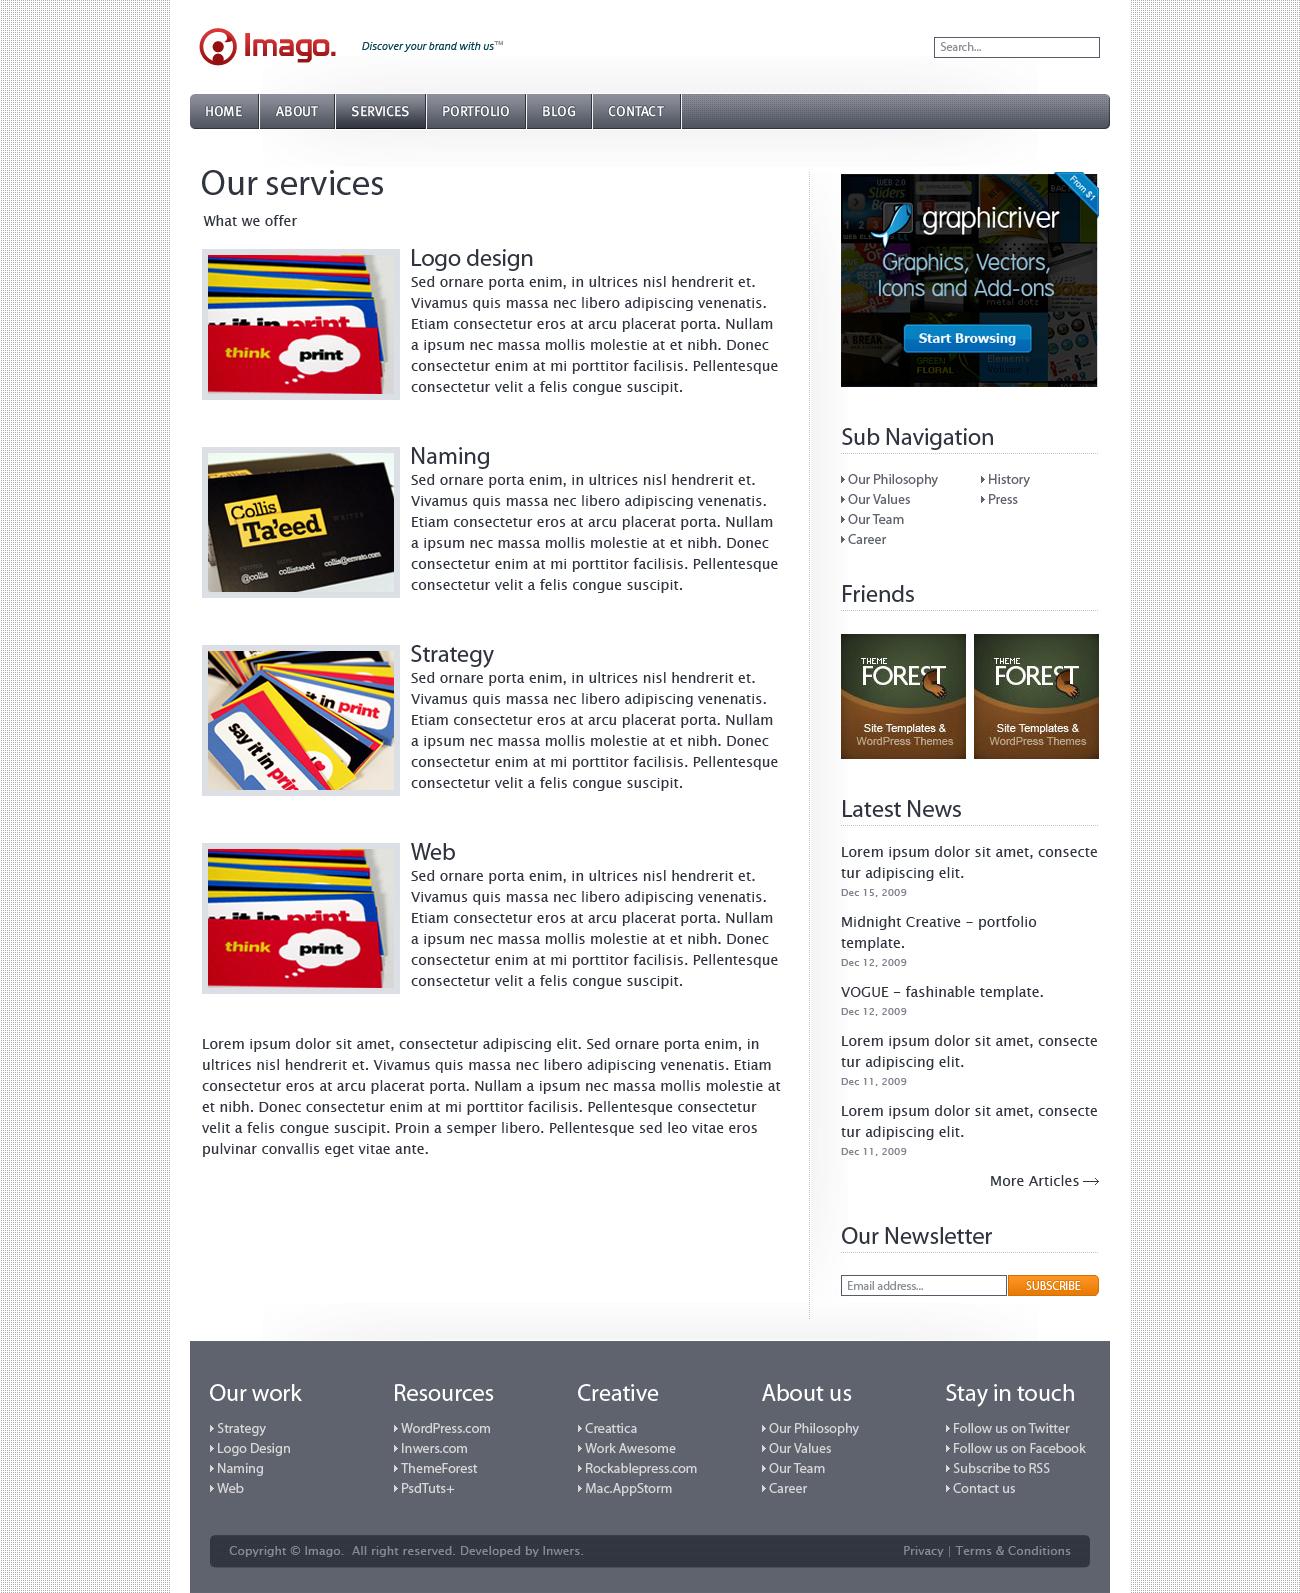 Imago - Business and Portfolio Template - 3_imago_services